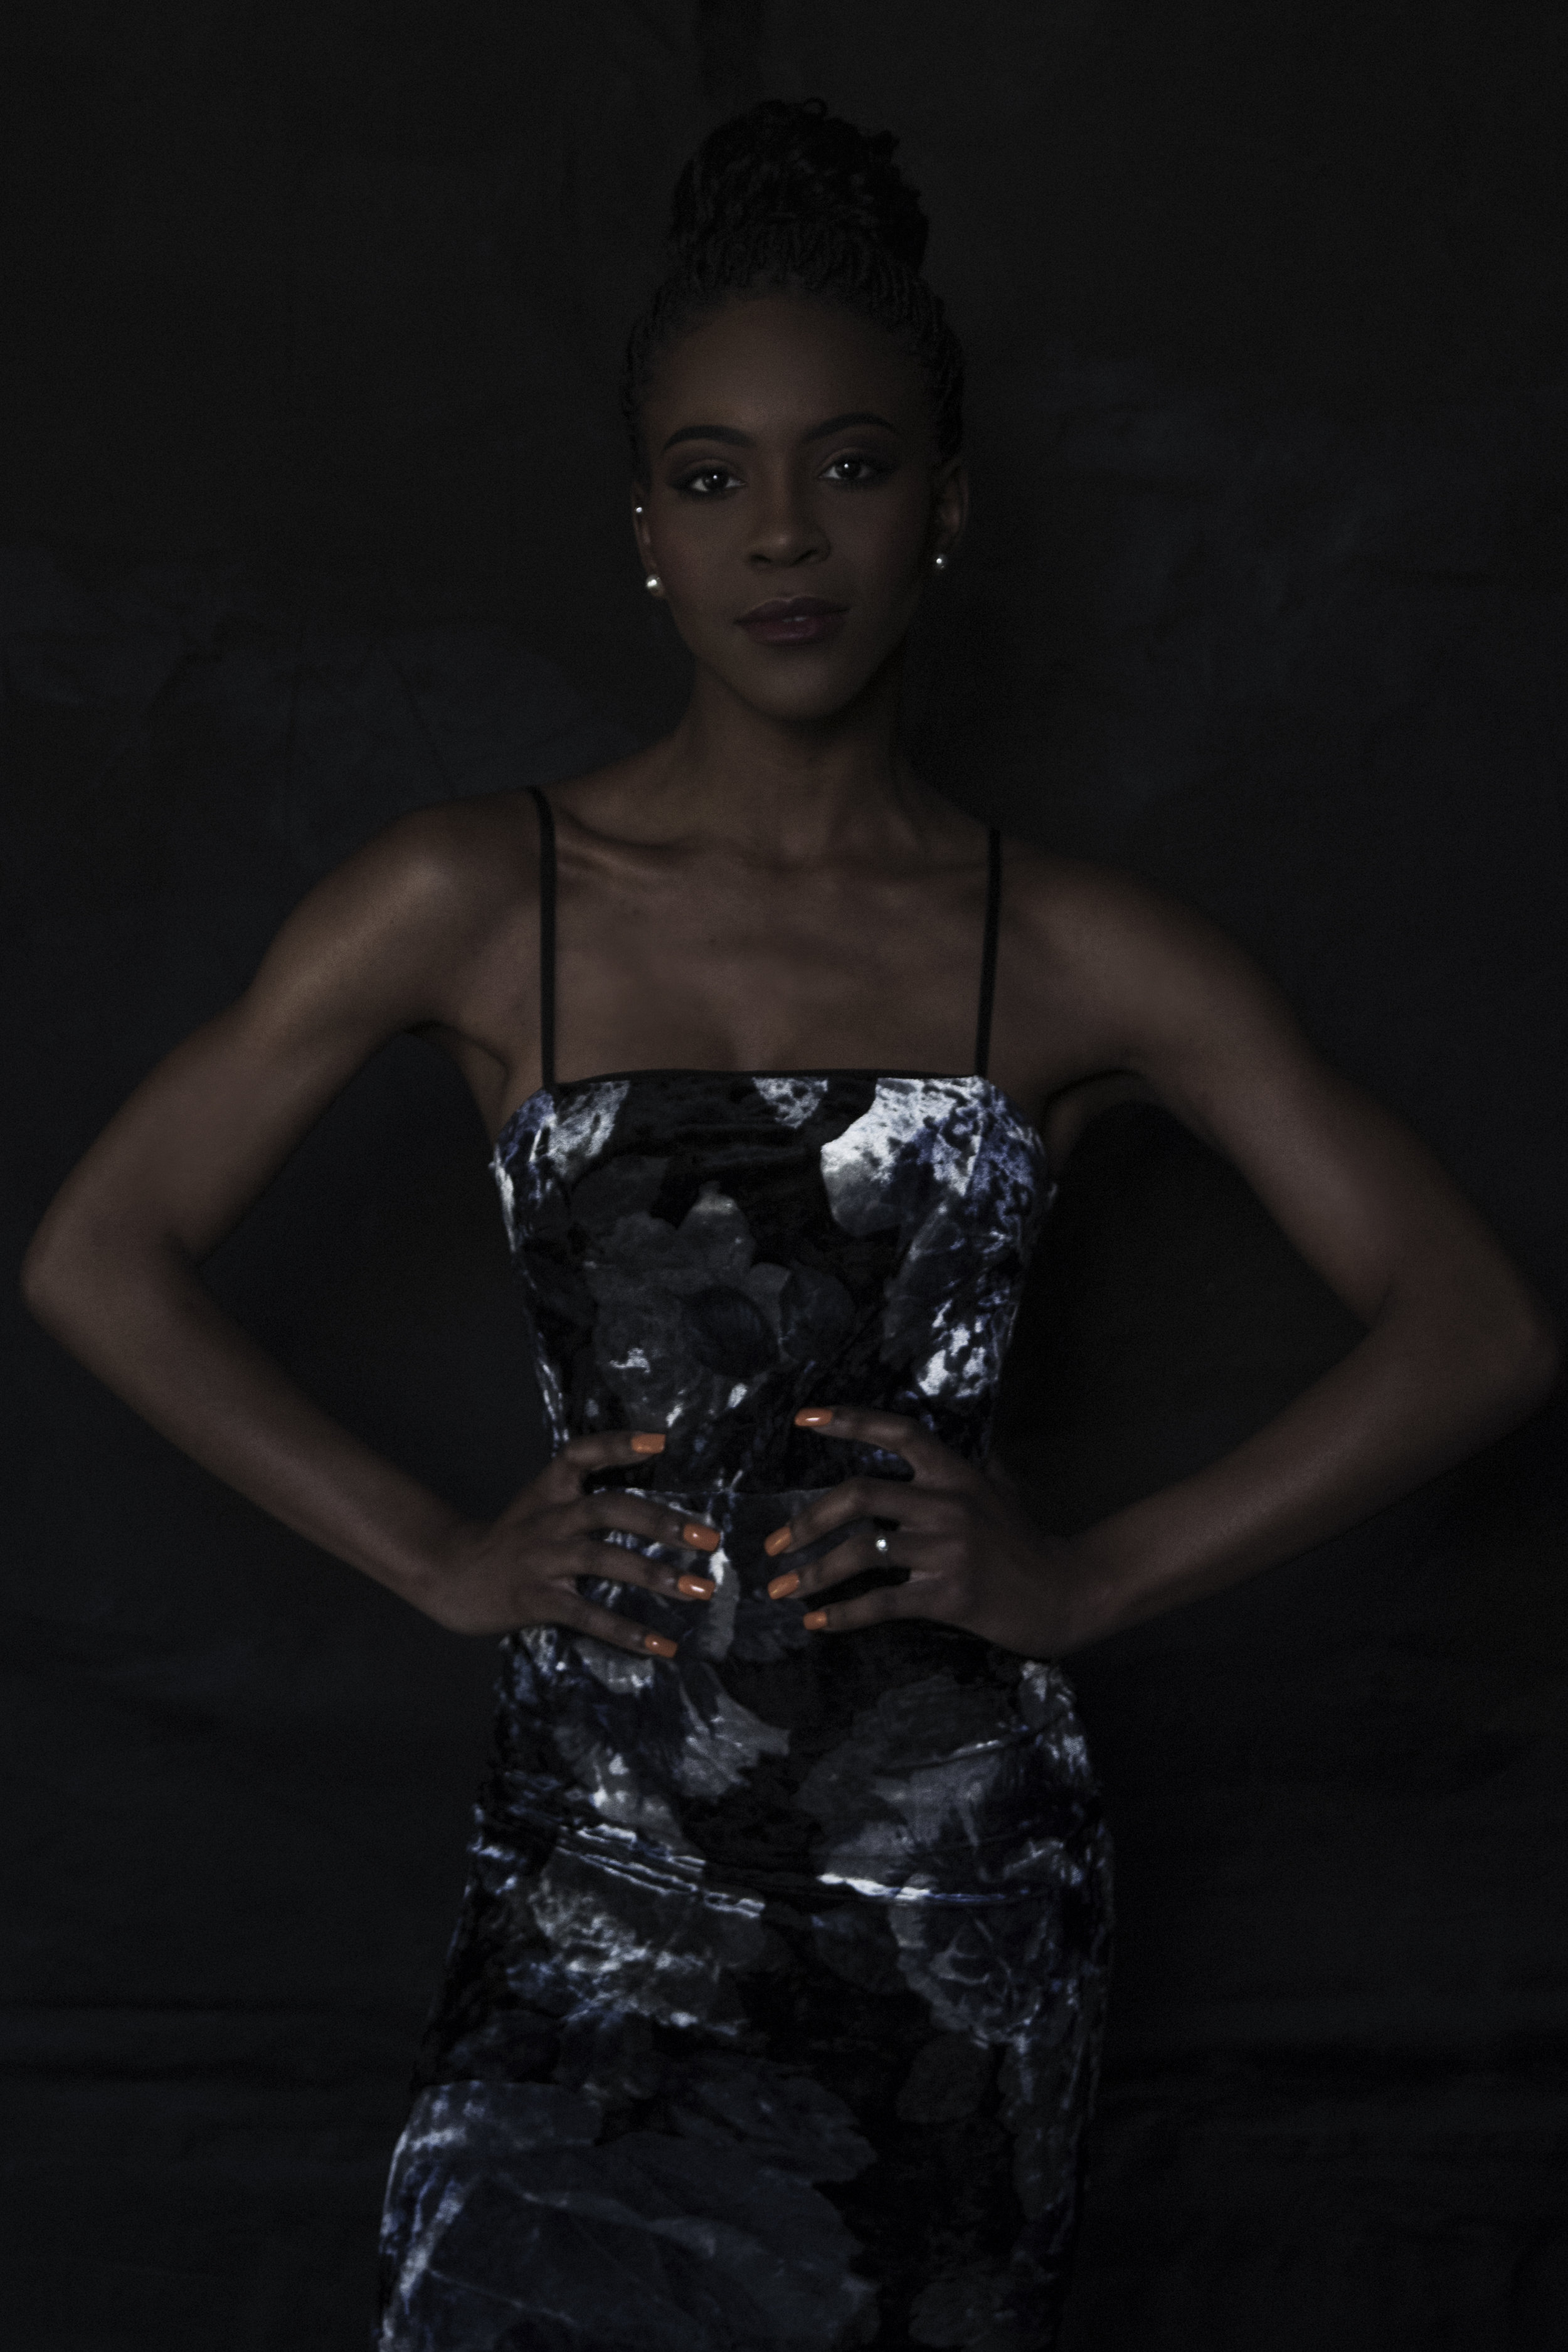 Dark Portrait of a stunning woman